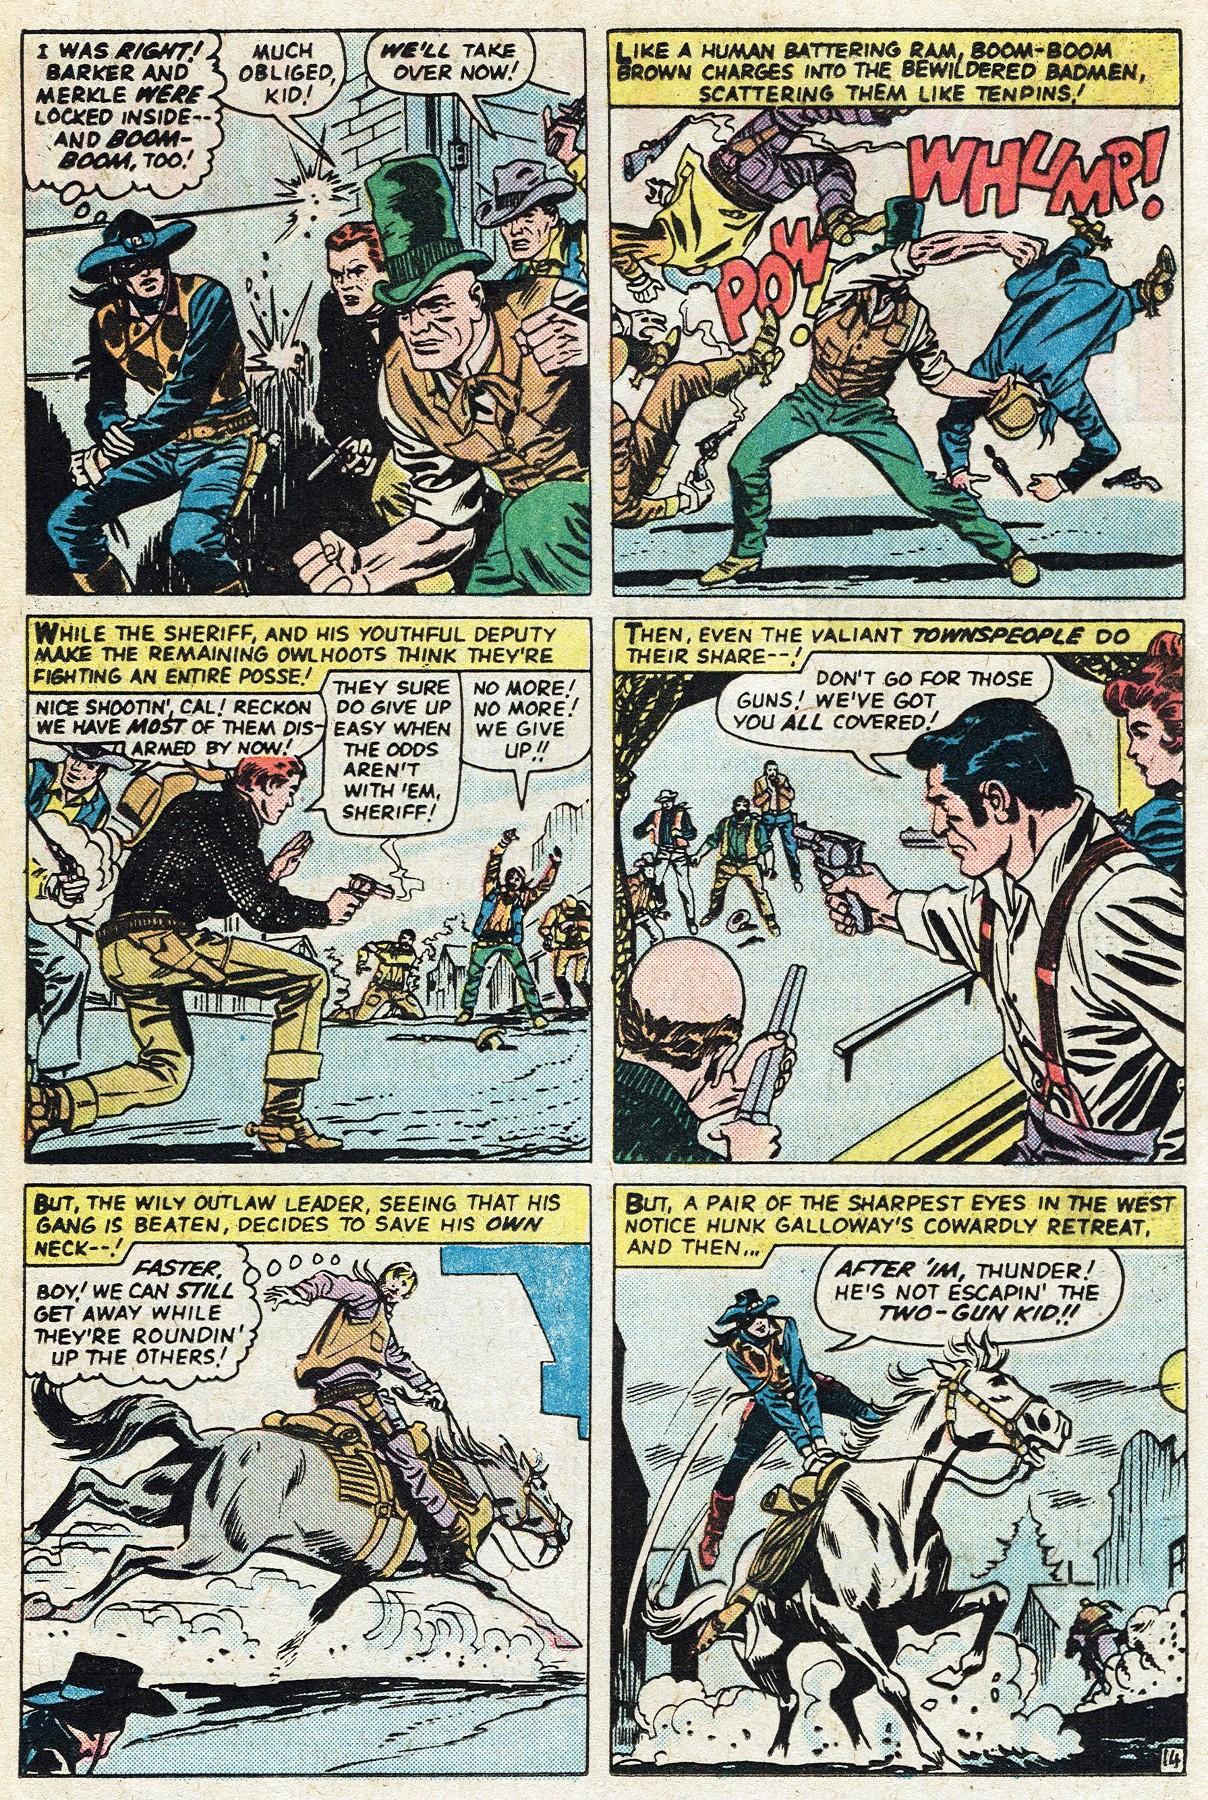 Read online Two-Gun Kid comic -  Issue #122 - 24